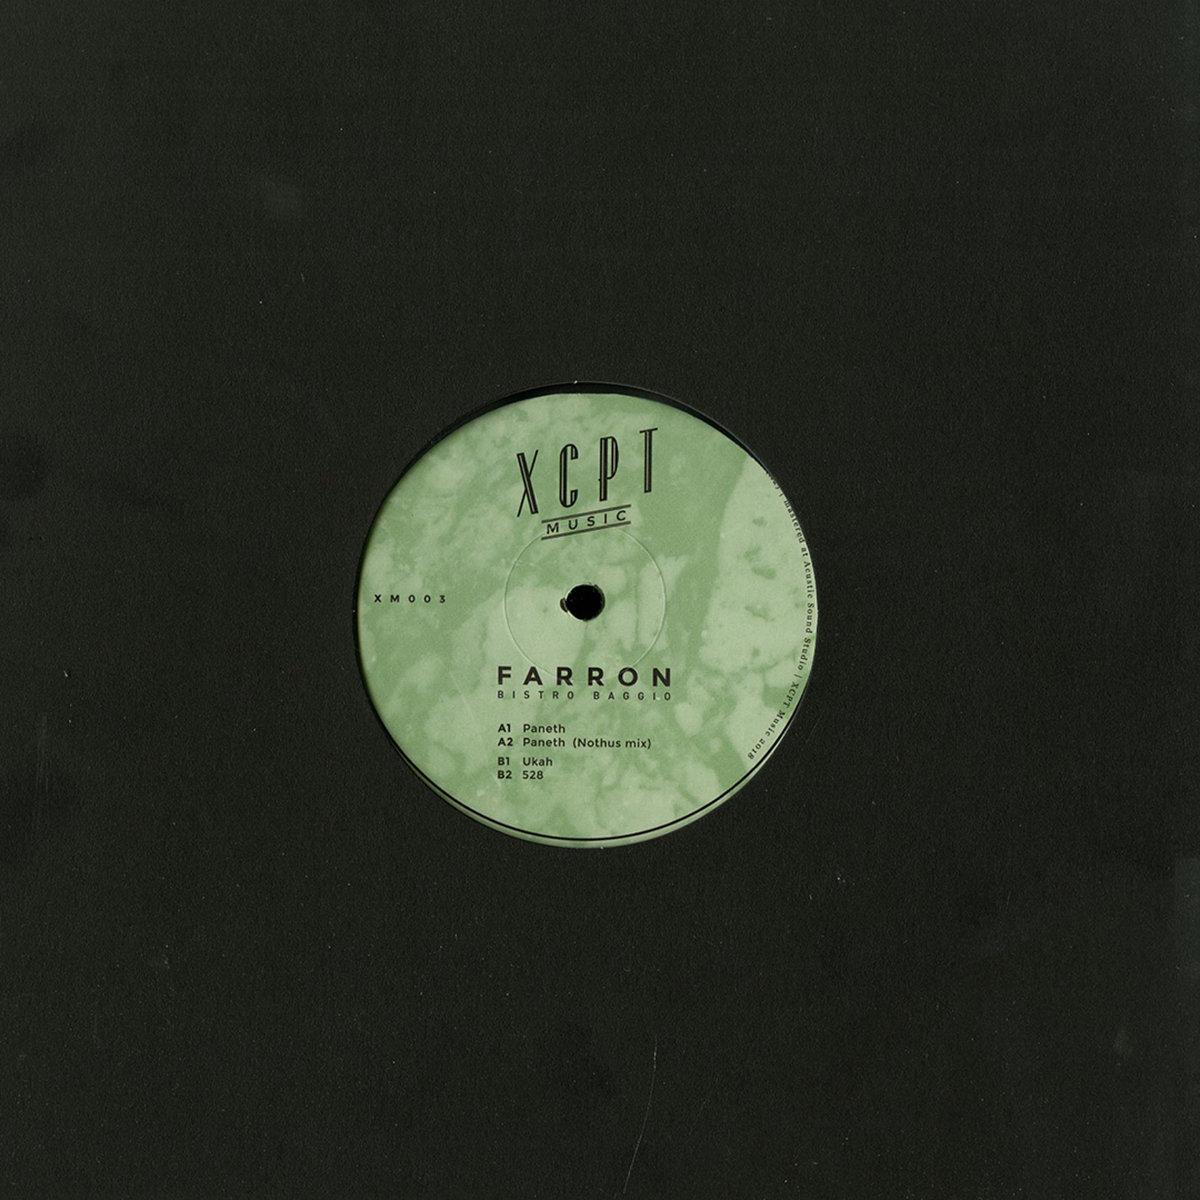 B2  528   XCPT Music